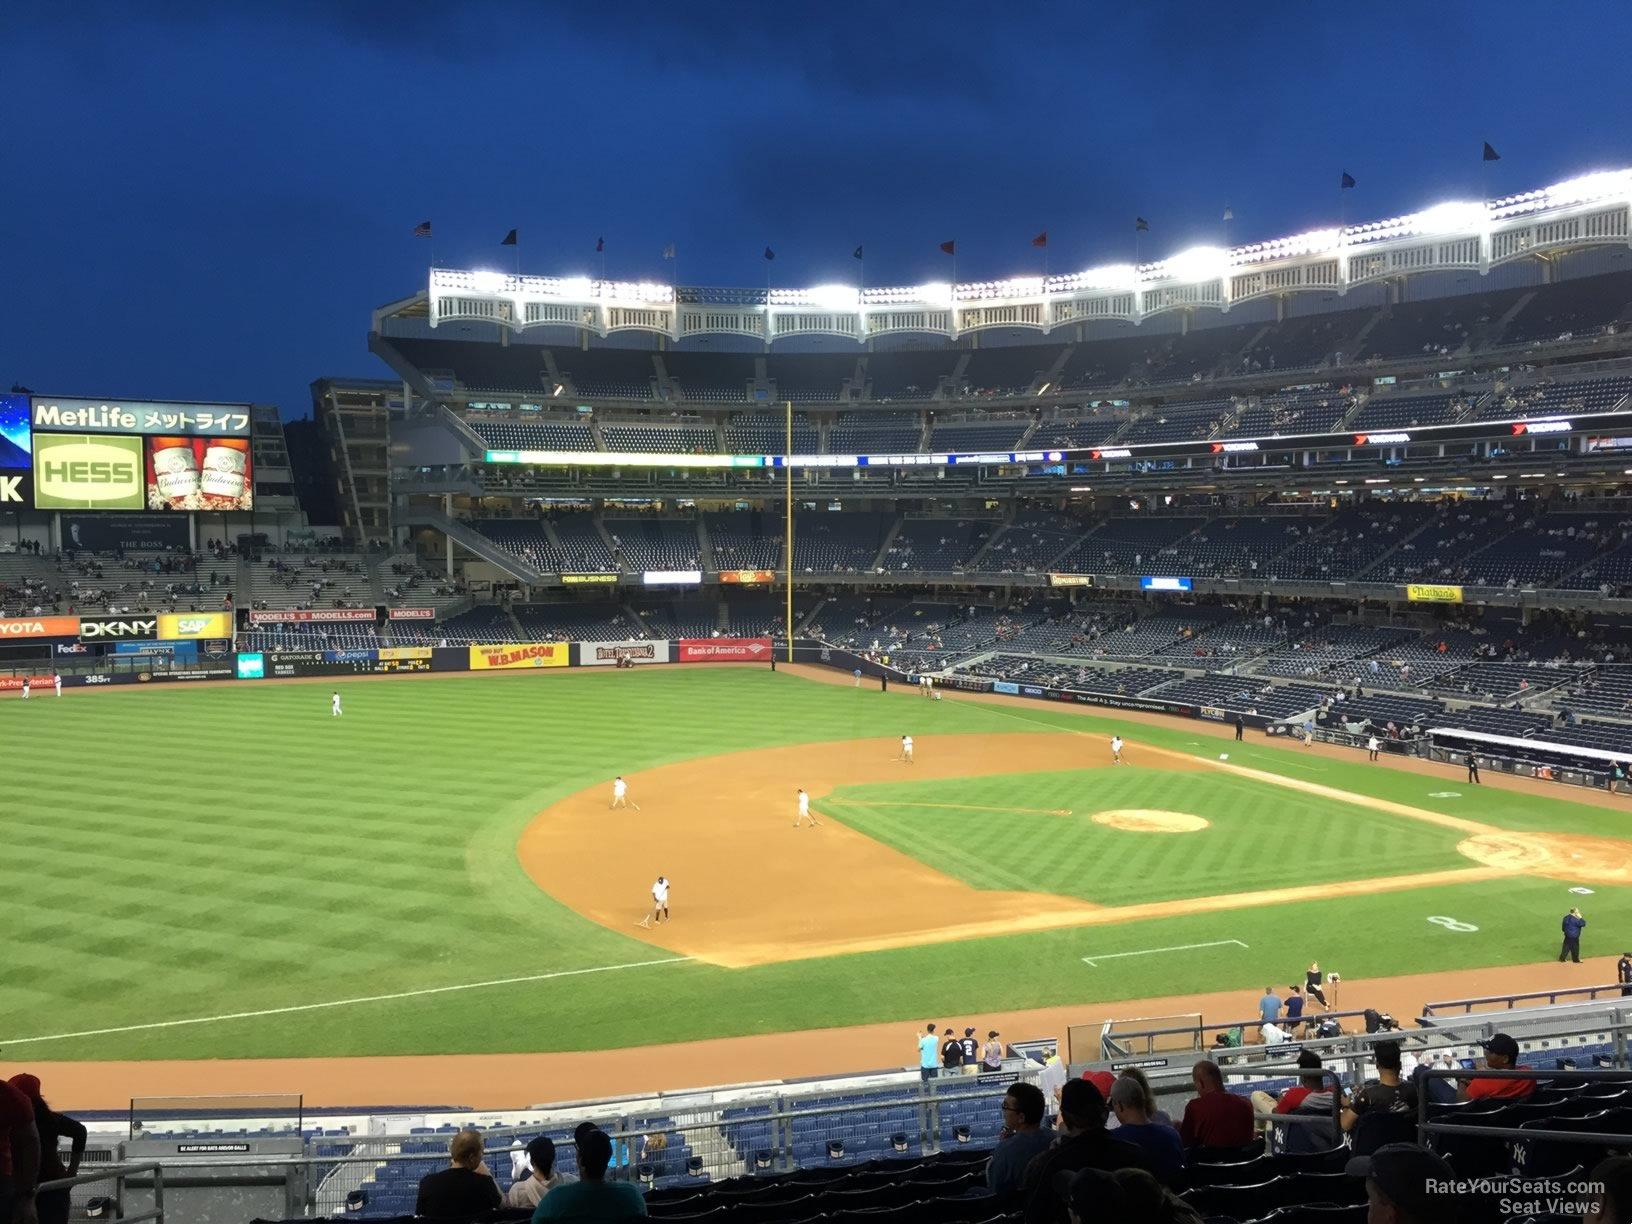 Yankee Stadium Section 227A - New York Yankees - RateYourSeats.com